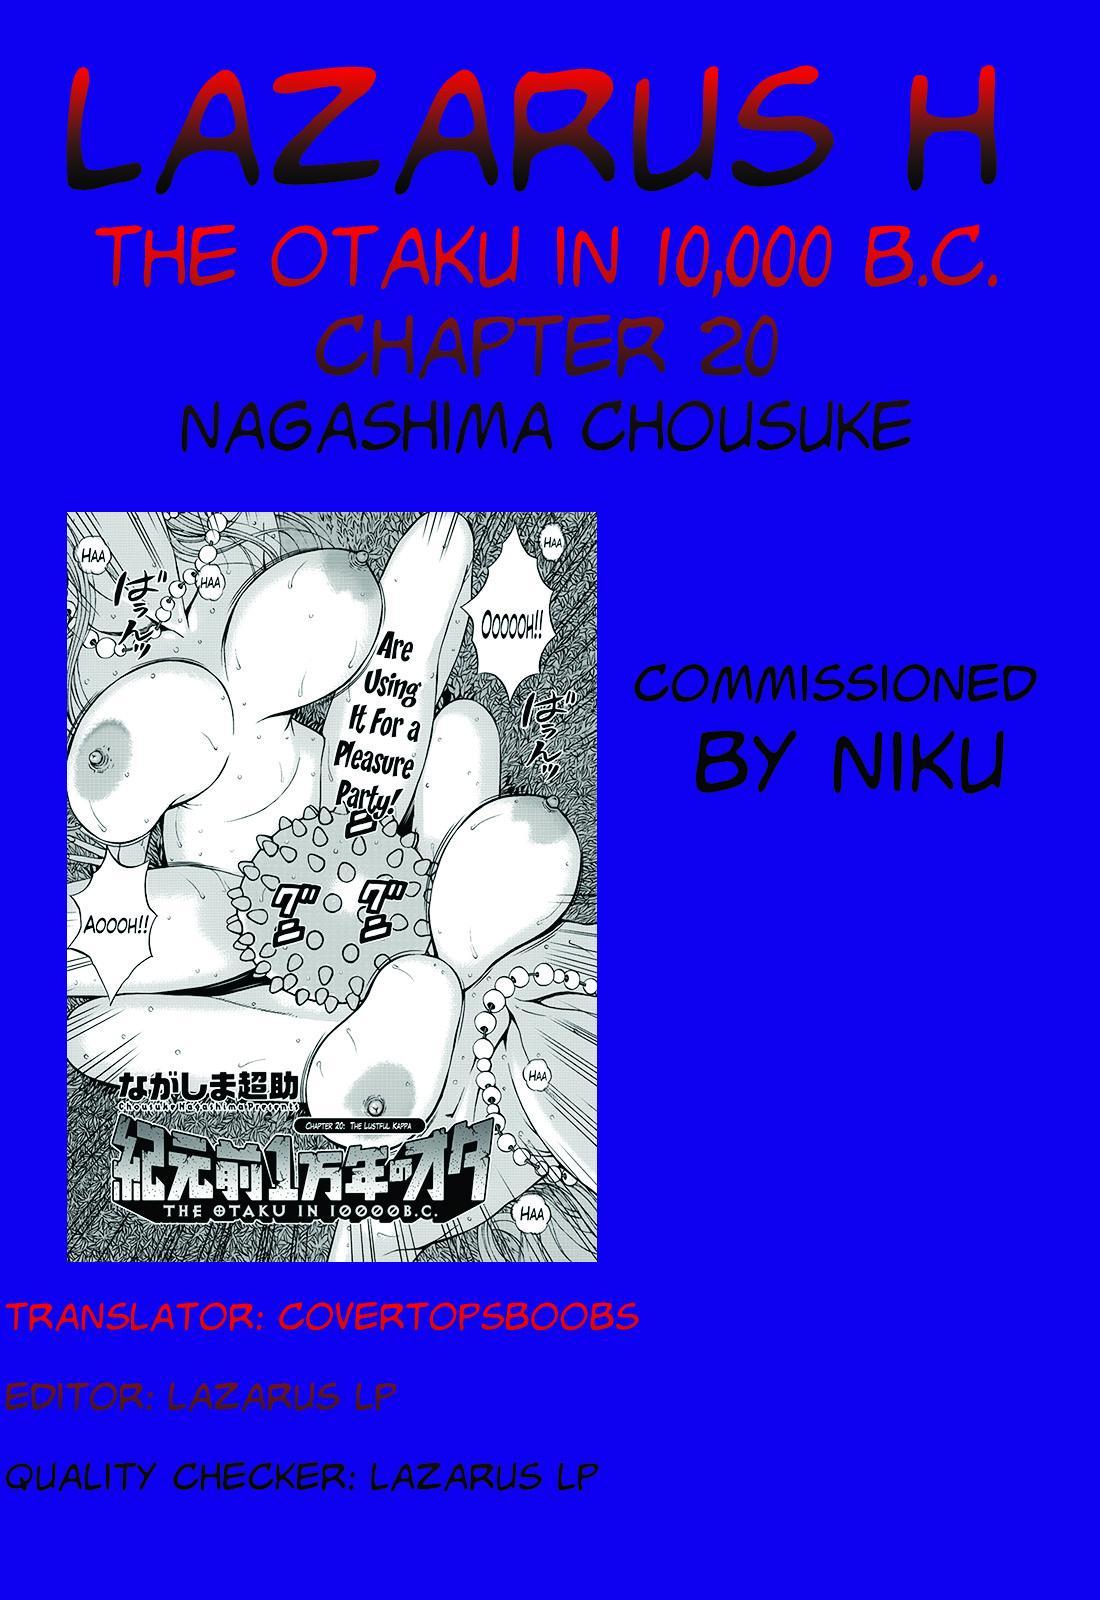 Kigenzen 10000 Nen no Ota   The Otaku in 10,000 B.C. Ch. 1-22 384